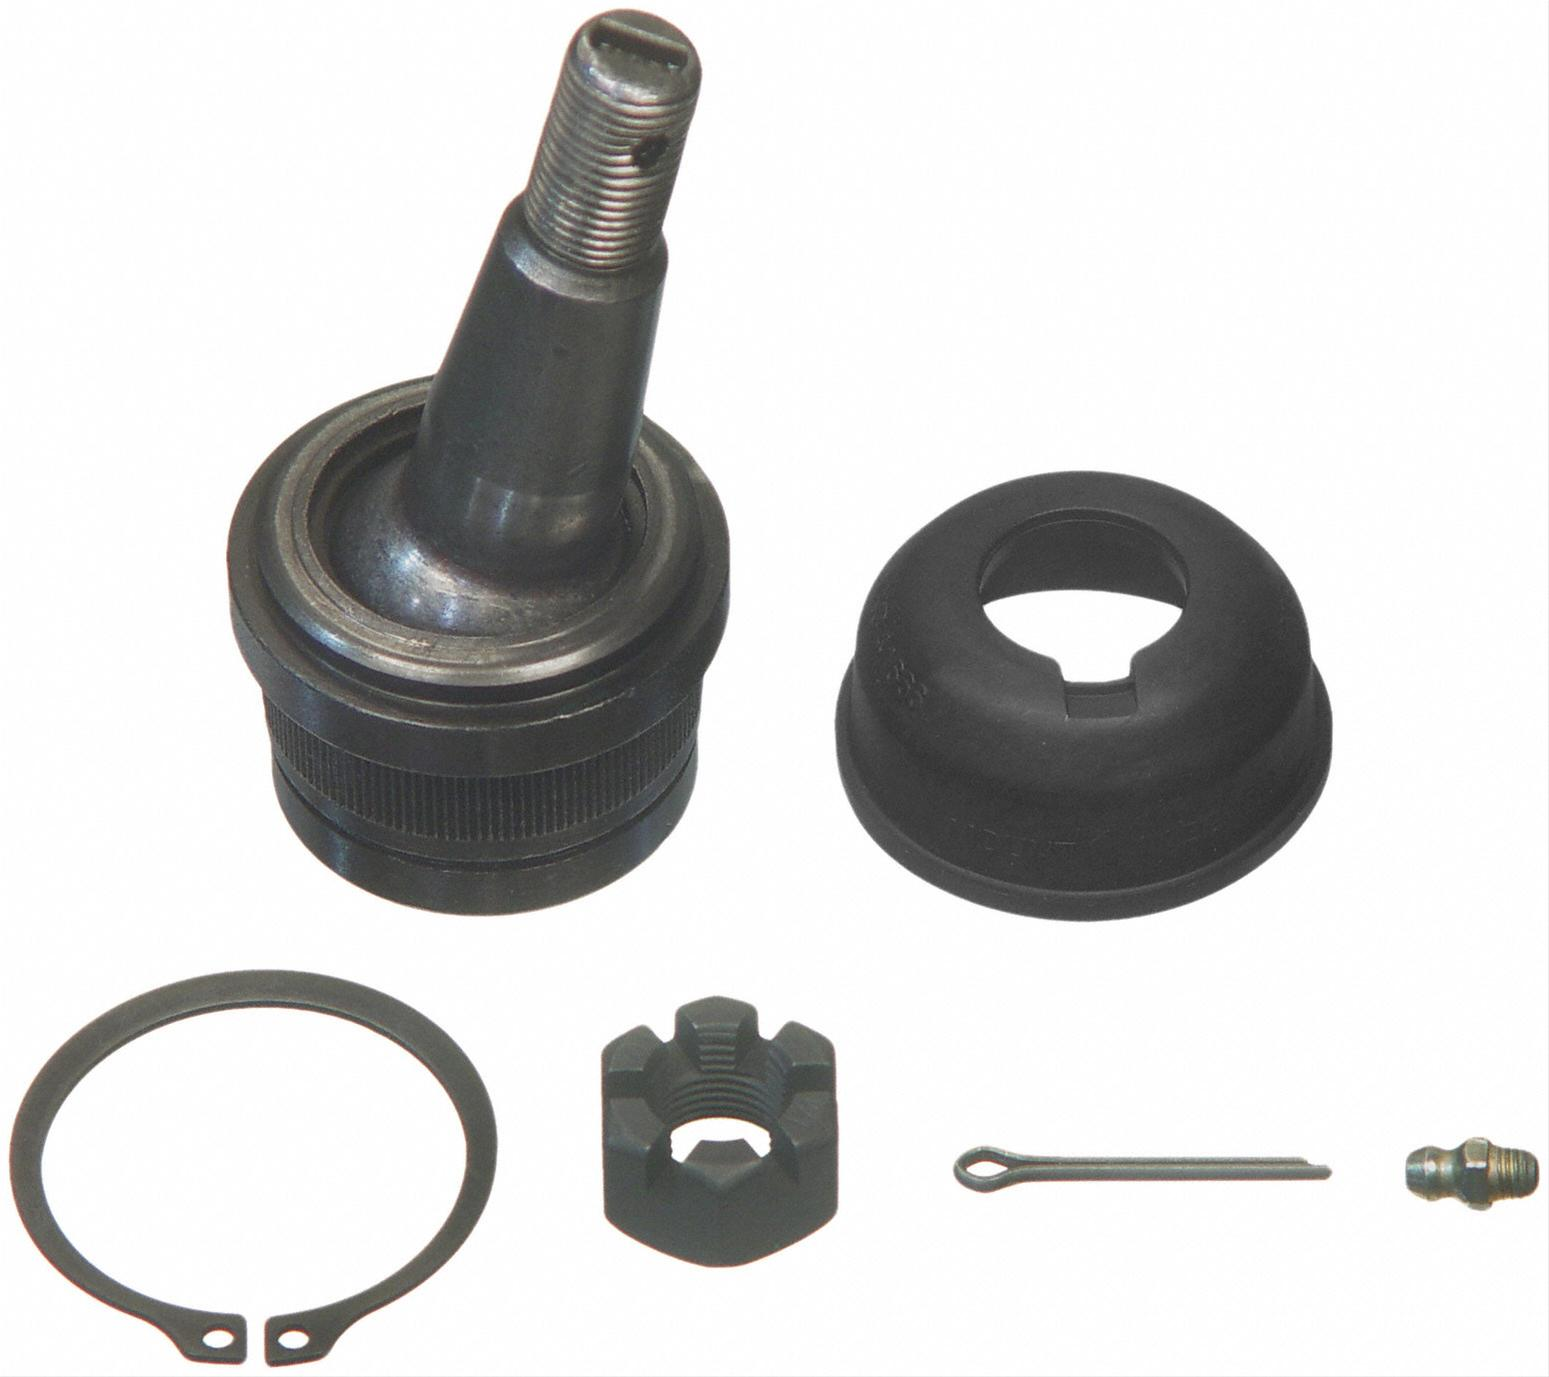 Suspension Ball Joint Front Lower Moog K7271 fits 97-99 Dodge Ram 1500